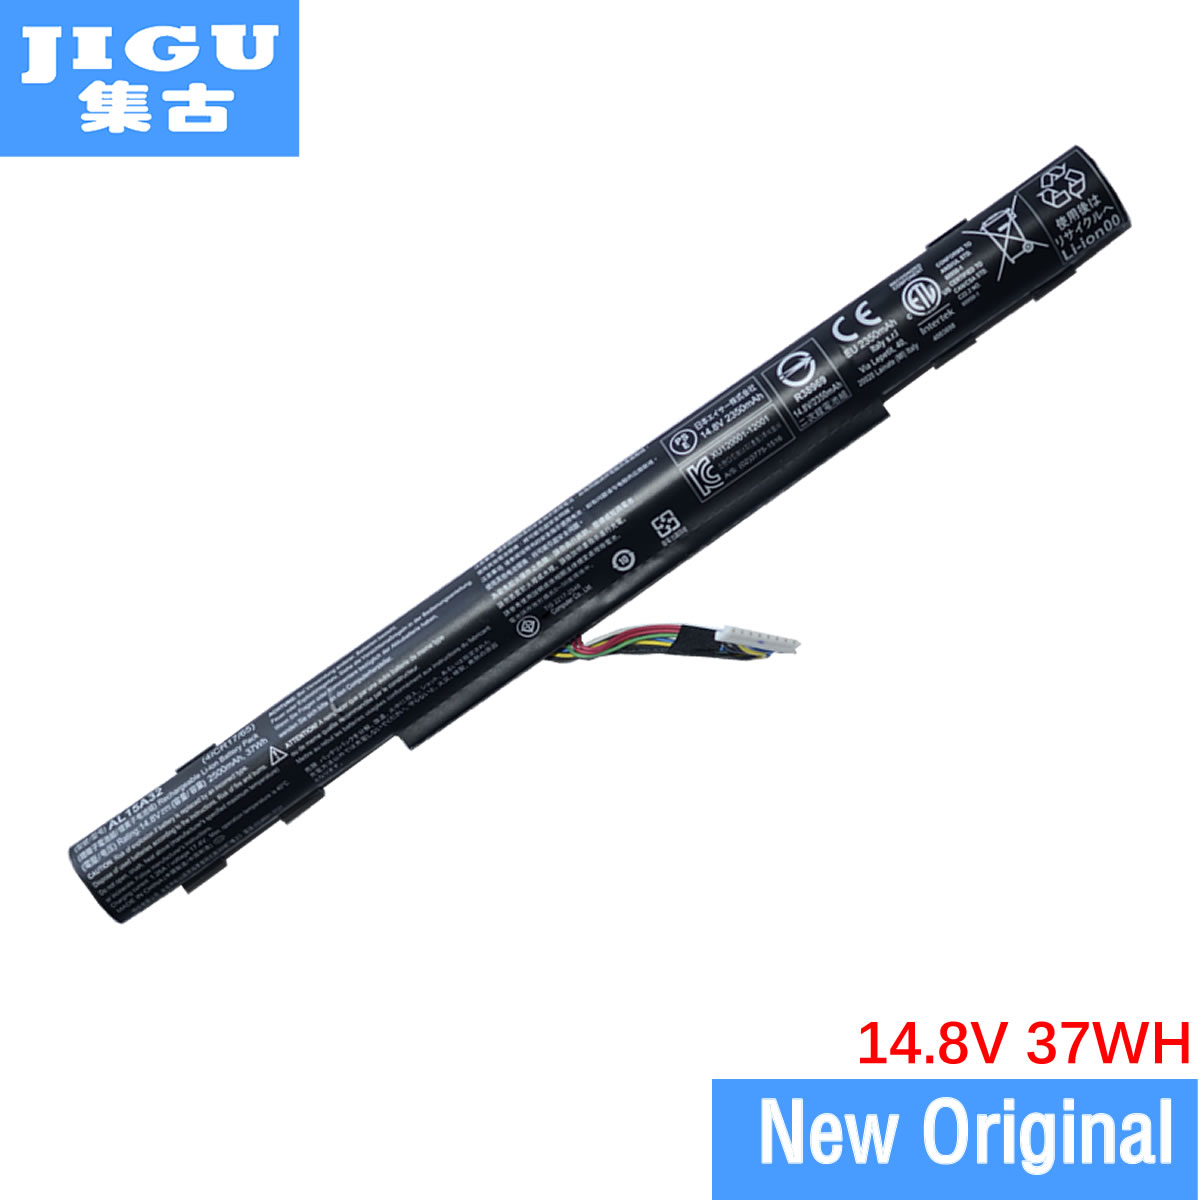 Original New for Dell PK1313G1A09 NSK-LR0SC 1D keyboard US Black